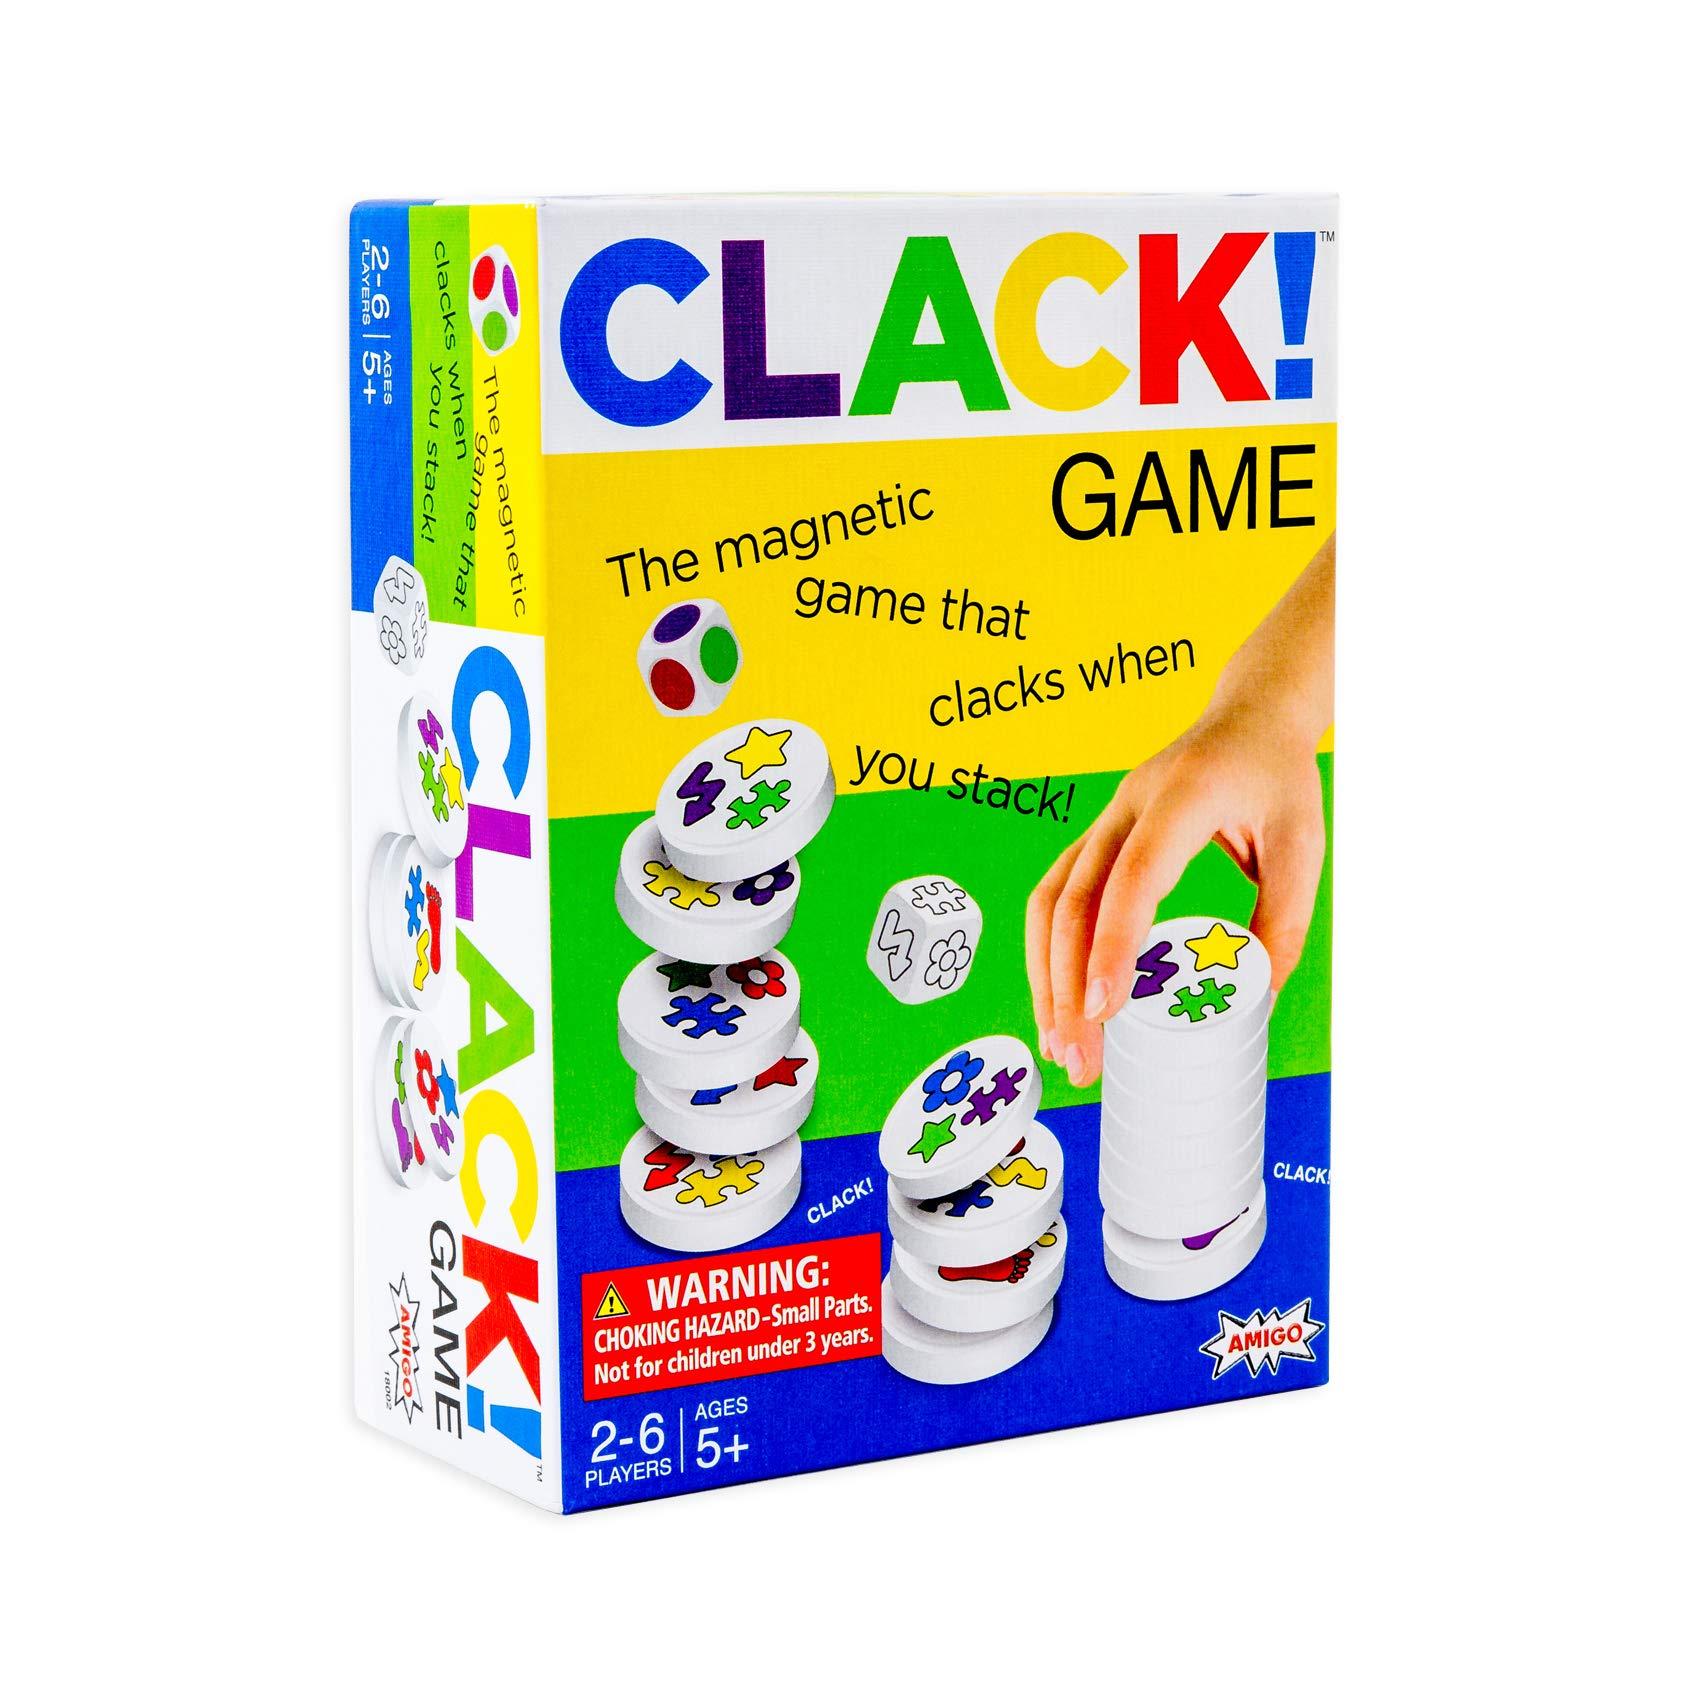 AMIGO CLACK! Kids Magnetic Stacking Game